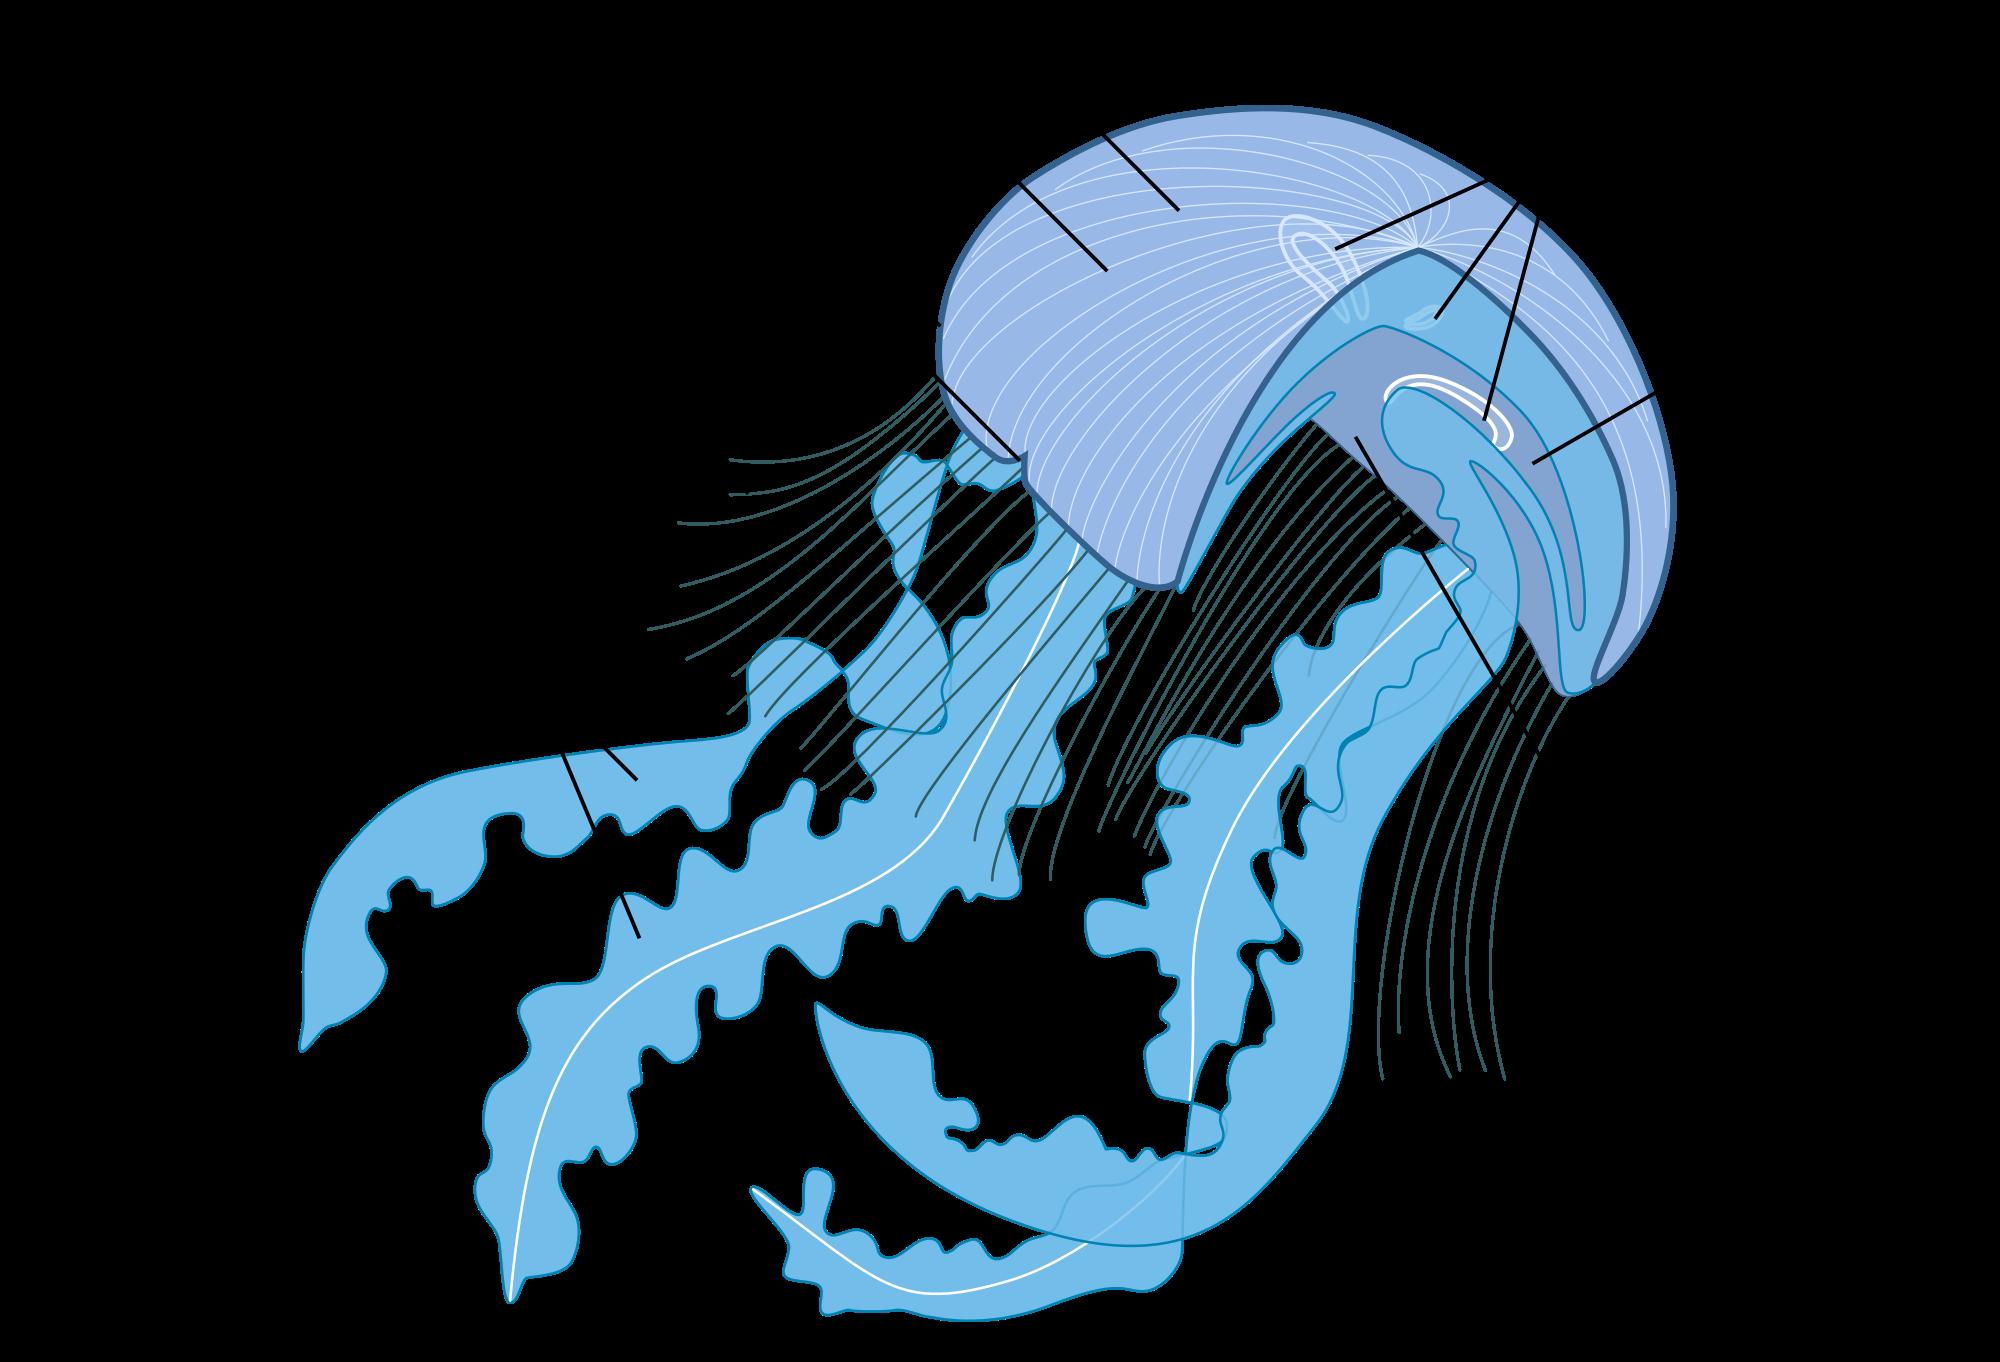 jellyfish anatomy google search zoology pinterest. Black Bedroom Furniture Sets. Home Design Ideas